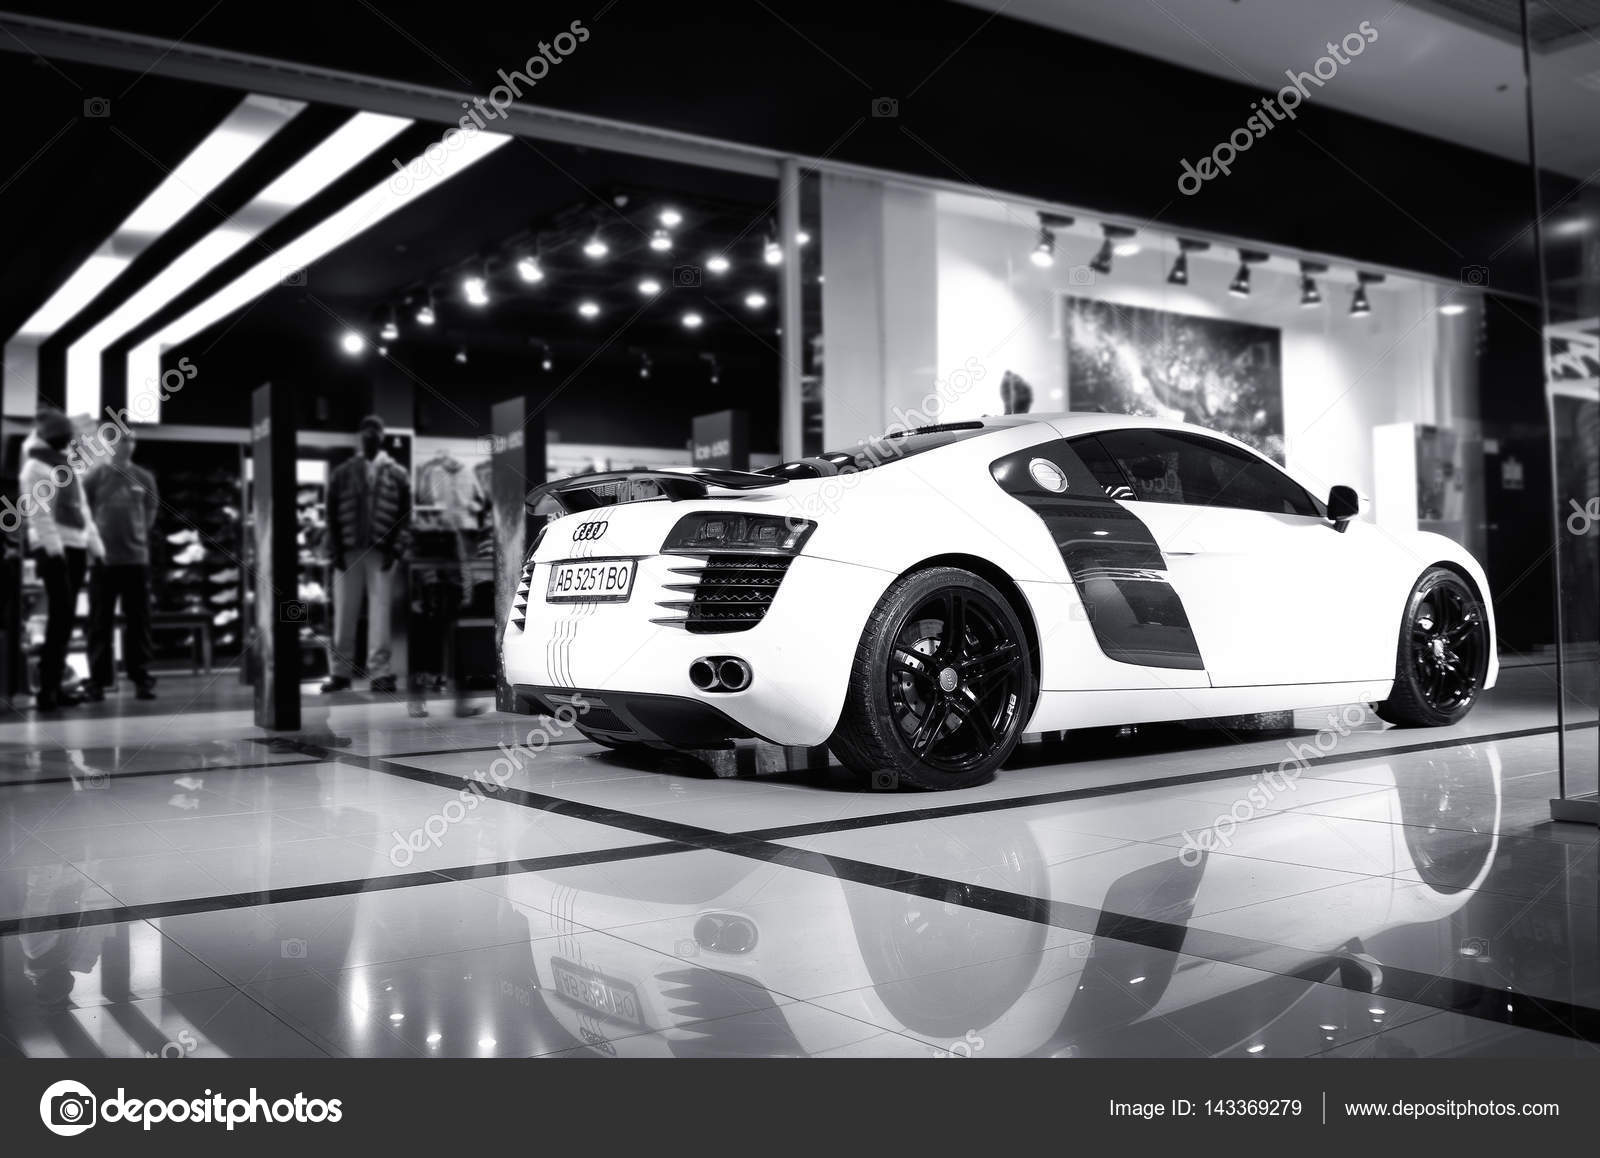 Audi R8 Concept Car.Audi Showroom.Presentation. Presentation Of The New  Model Audi Car   Audi R8.Front Of The Car,front Side, Logo Audi.